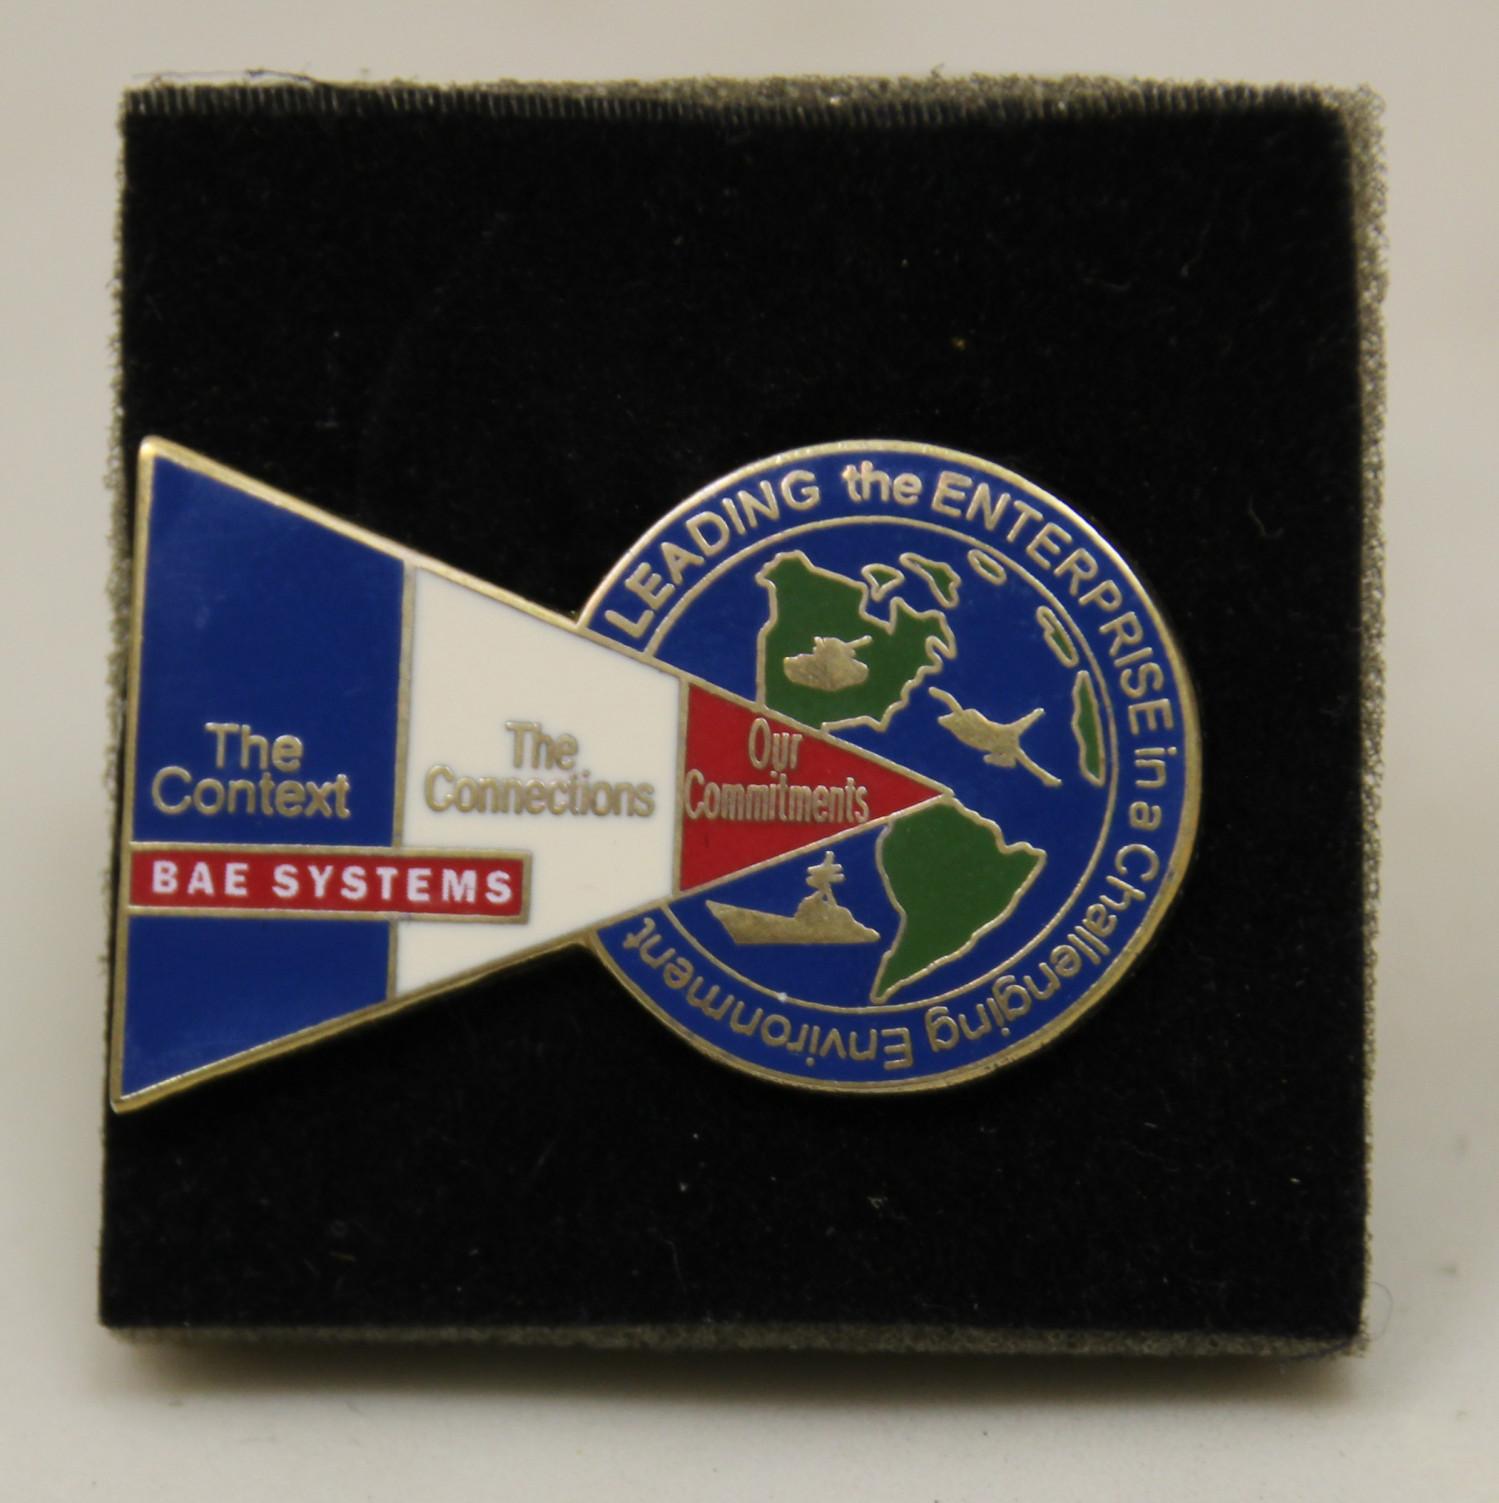 BAE Systems Badge